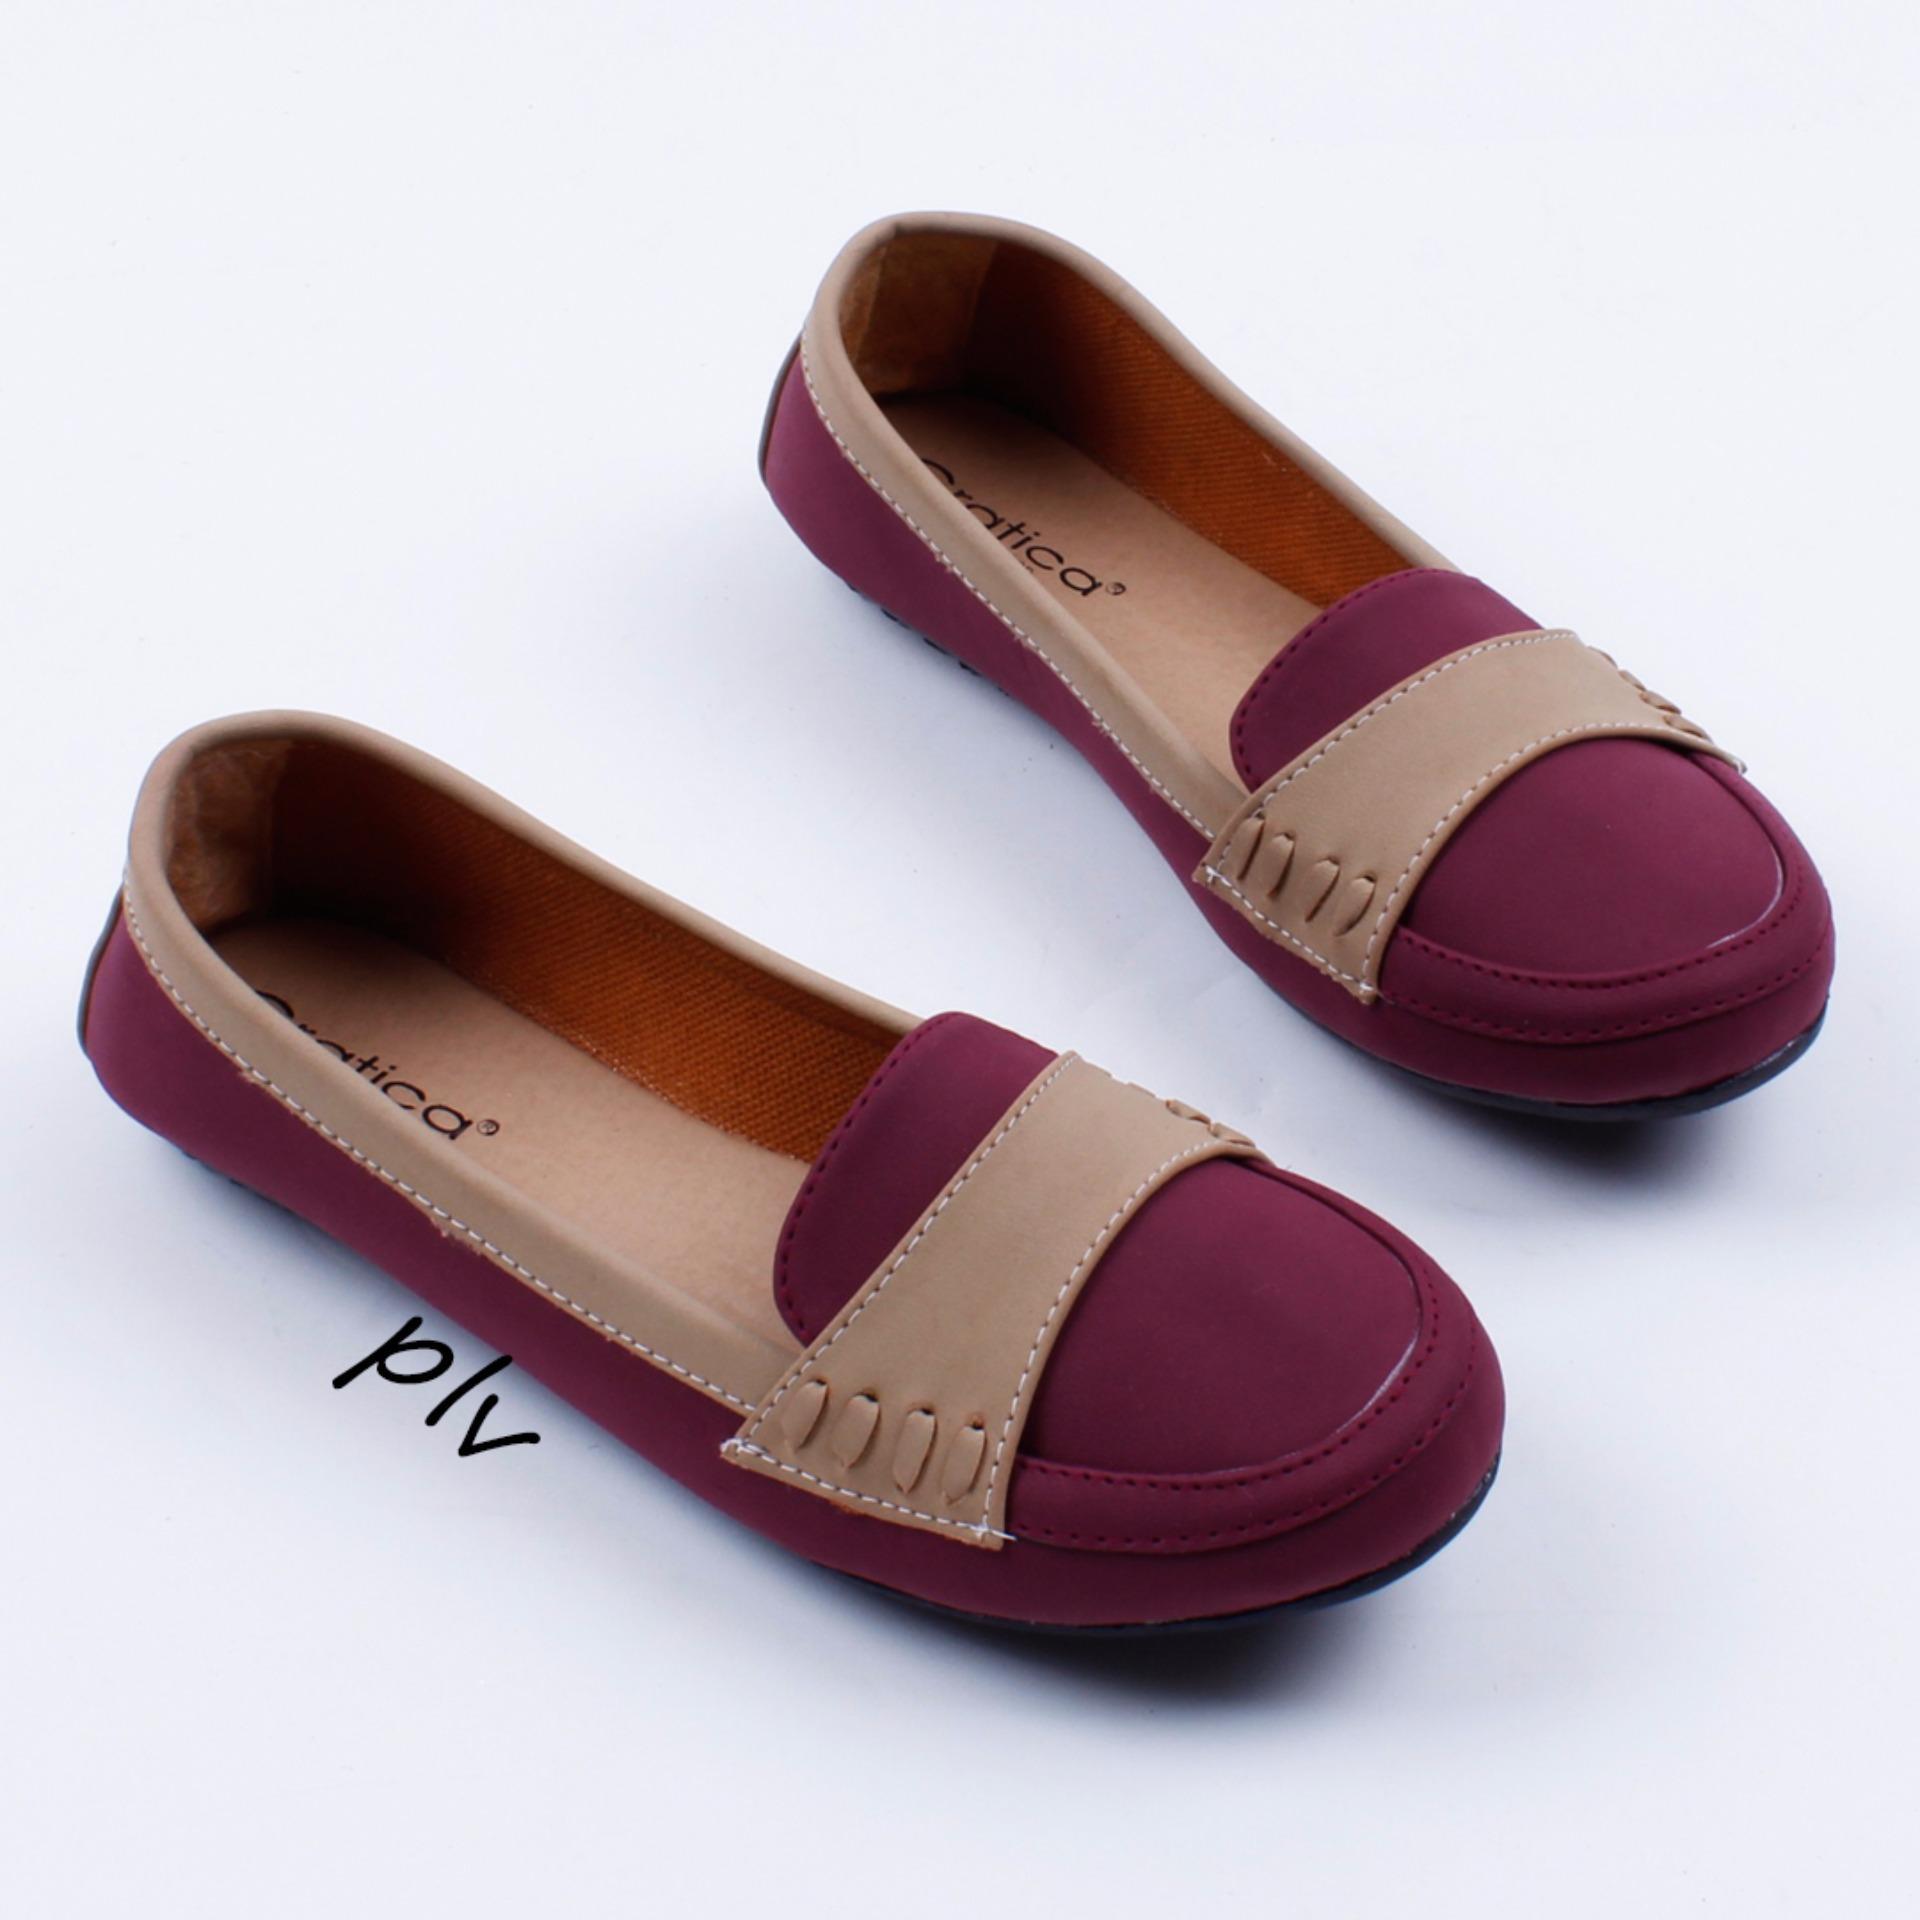 Flash Sale Gratica Sepatu Flat Shoes DS20 - Maroon